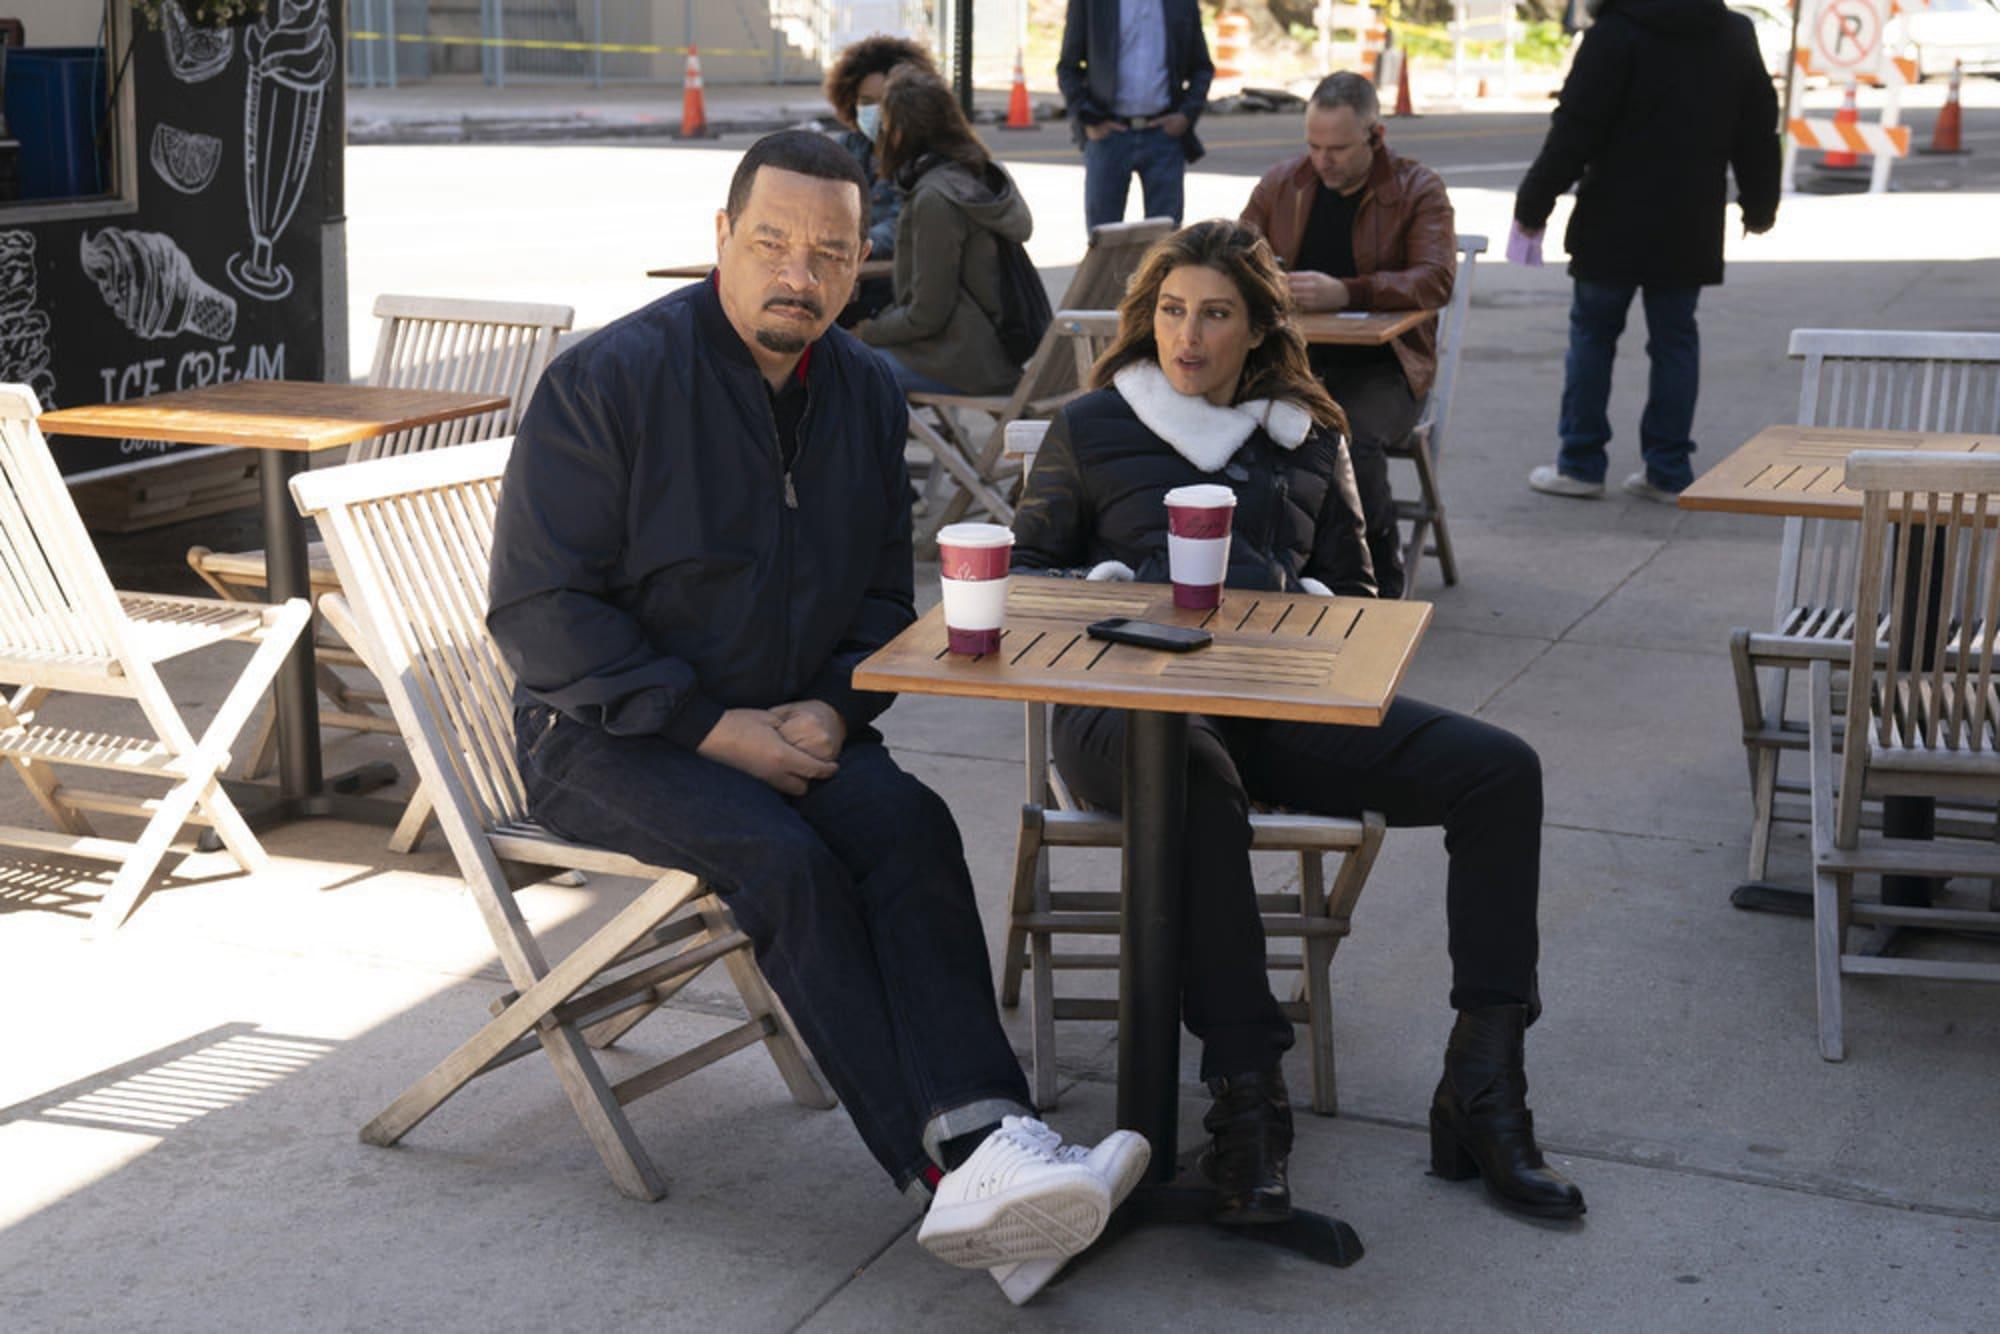 Law & Order: Special Victims Unit Season 23 Episode 3